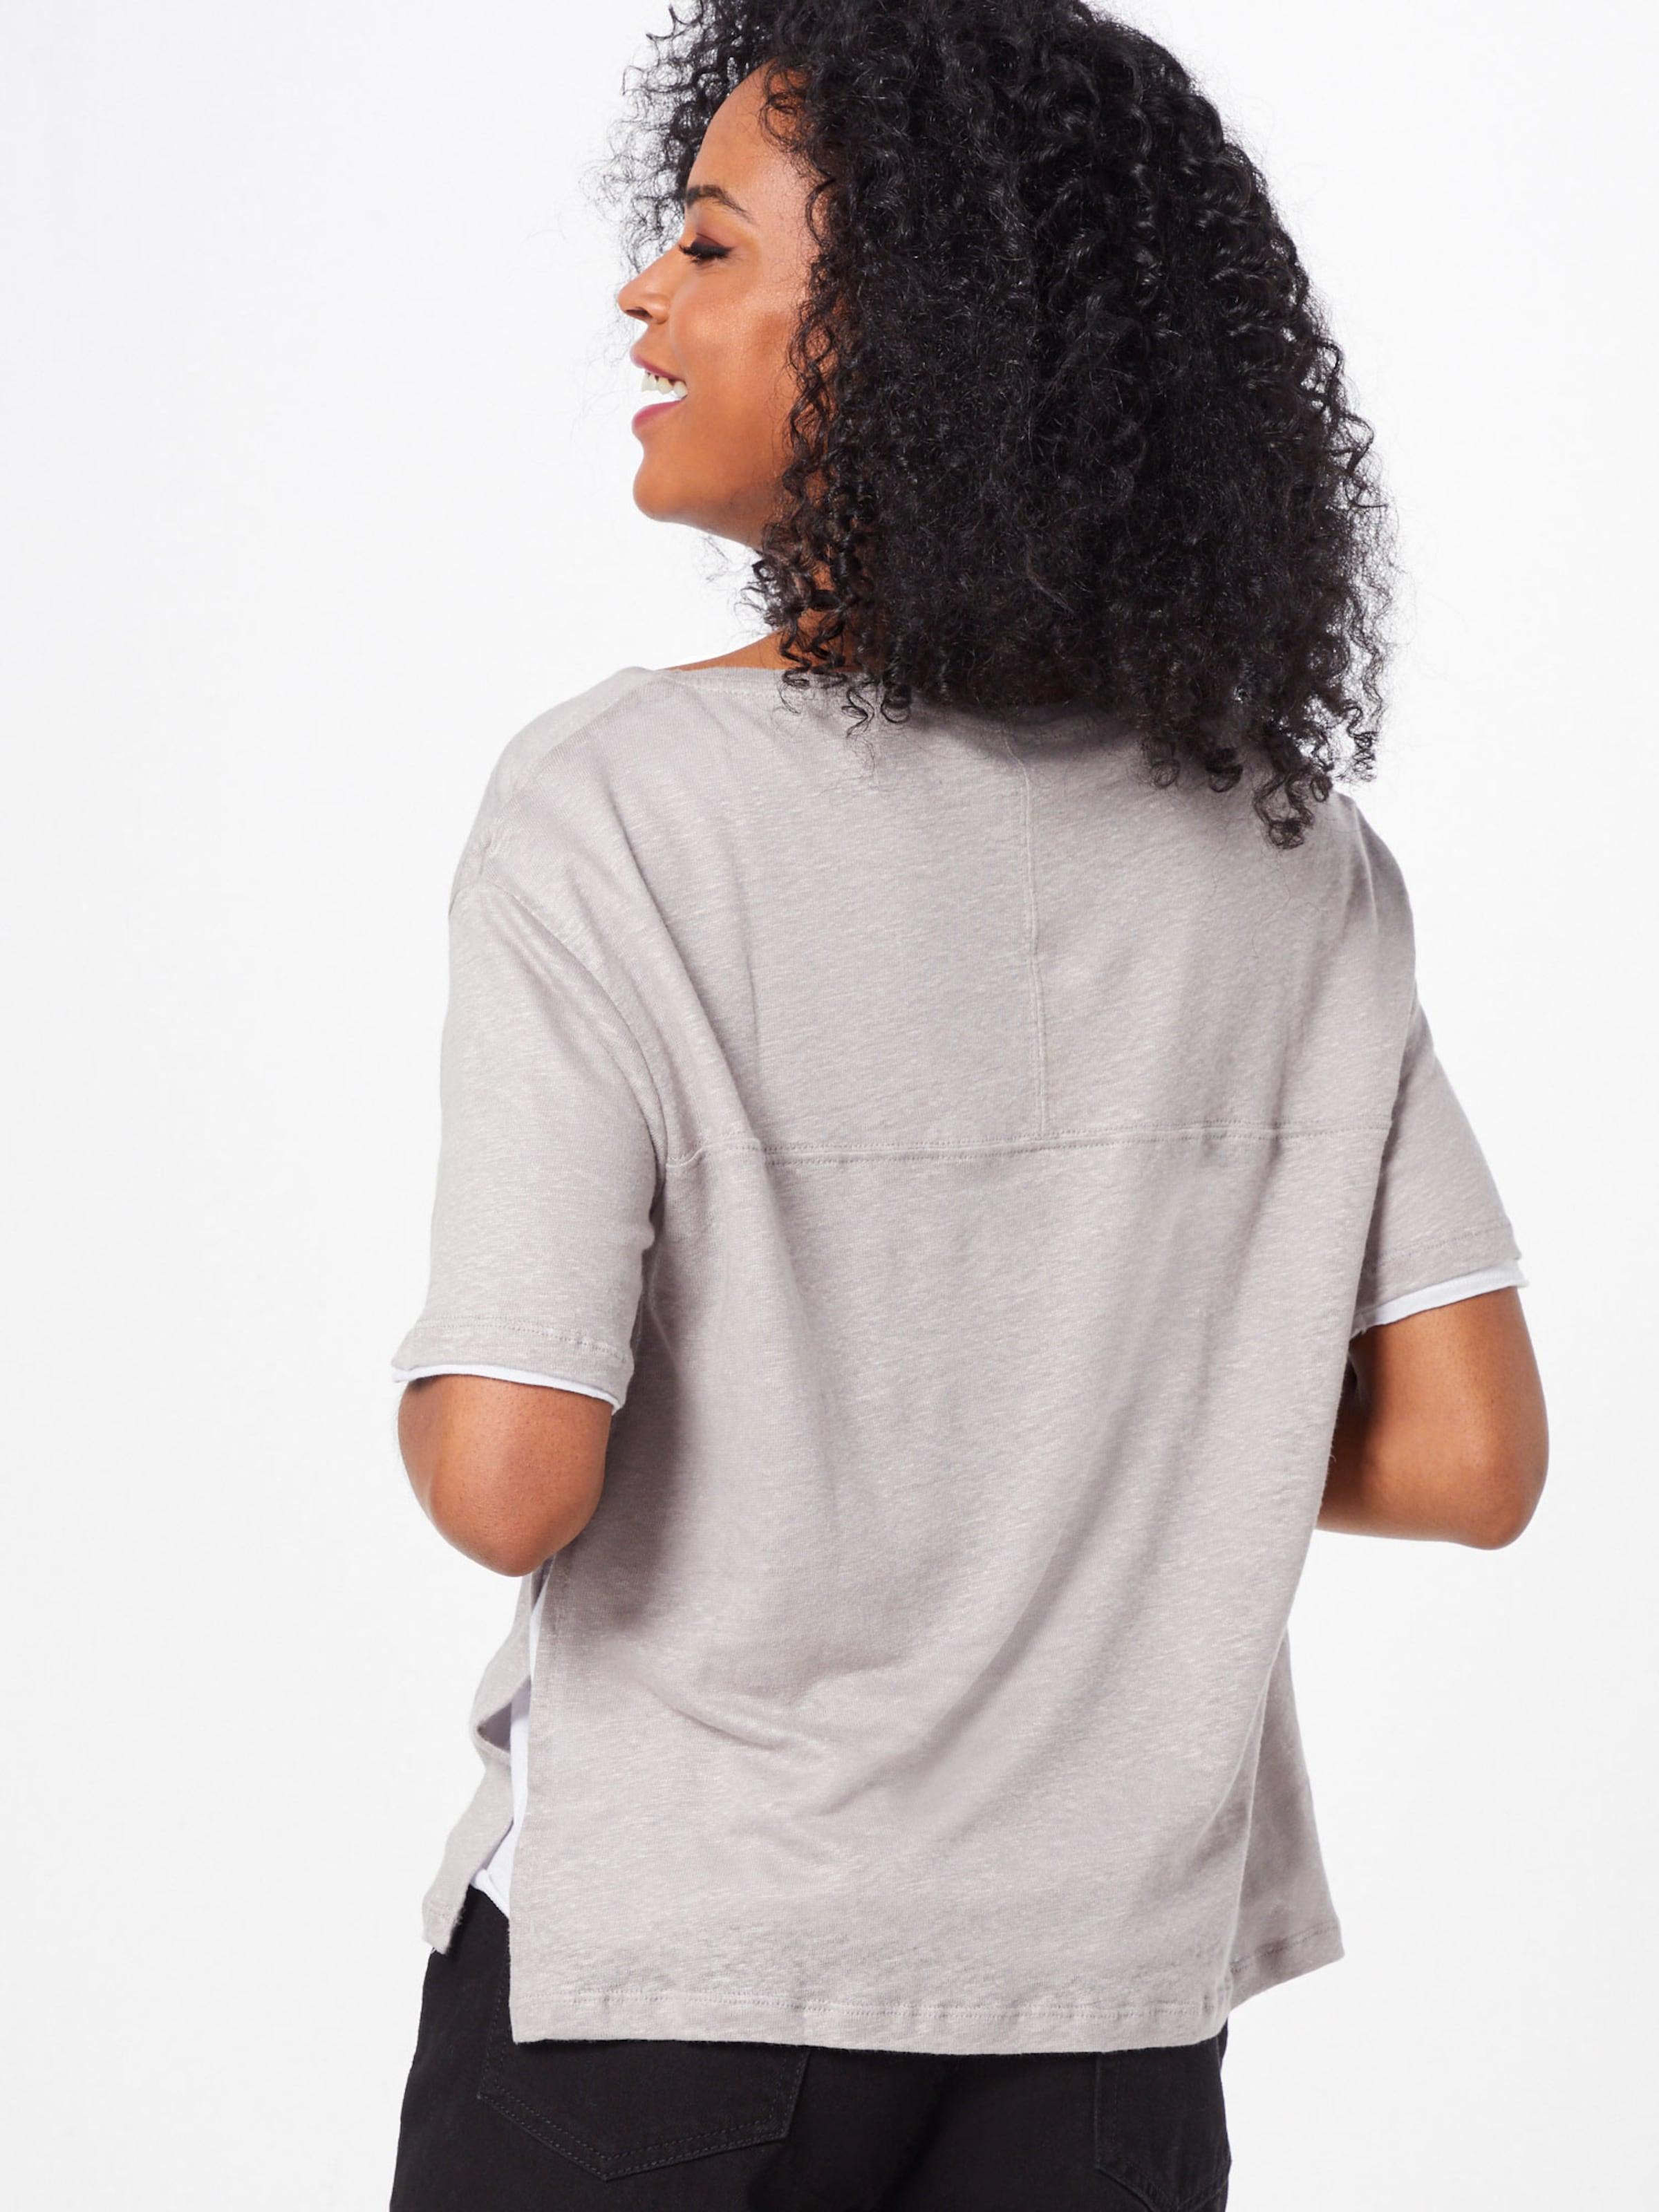 Gris En 81hours 'pauletta' shirt T EDW2YIeH9